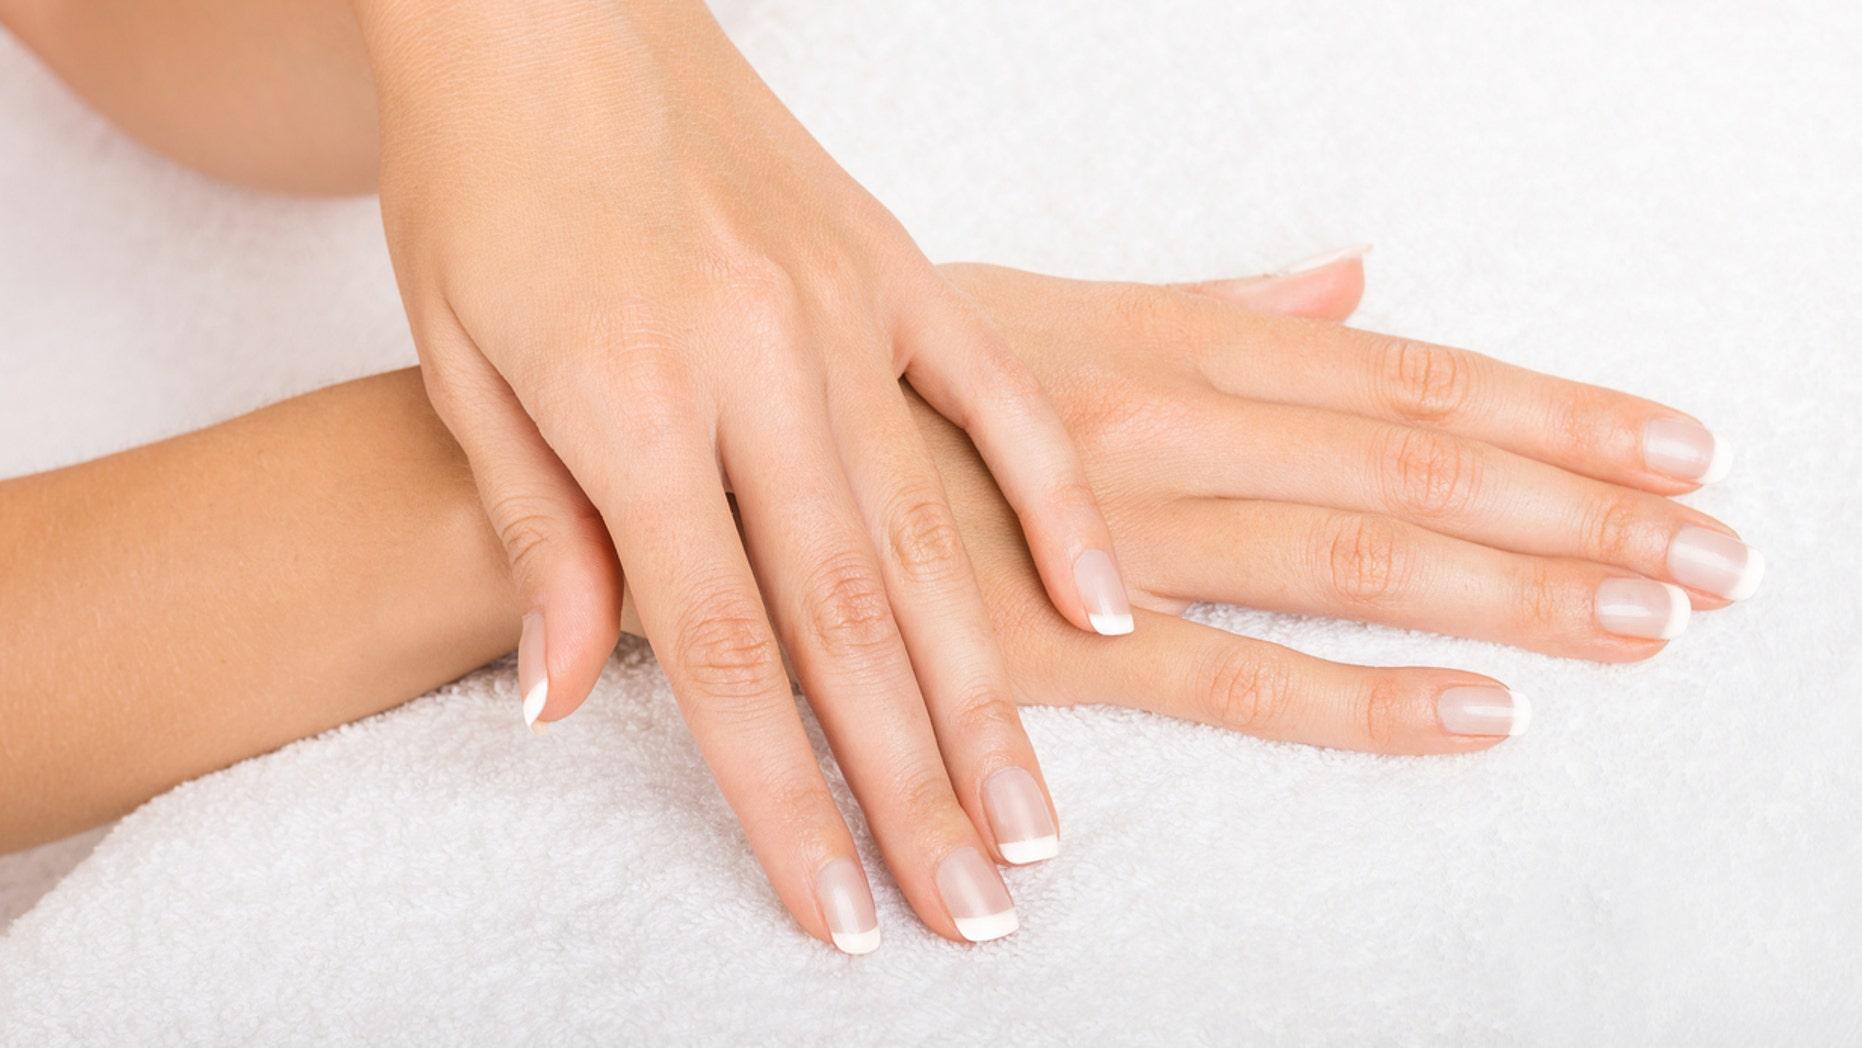 Hands on towel - Manicure